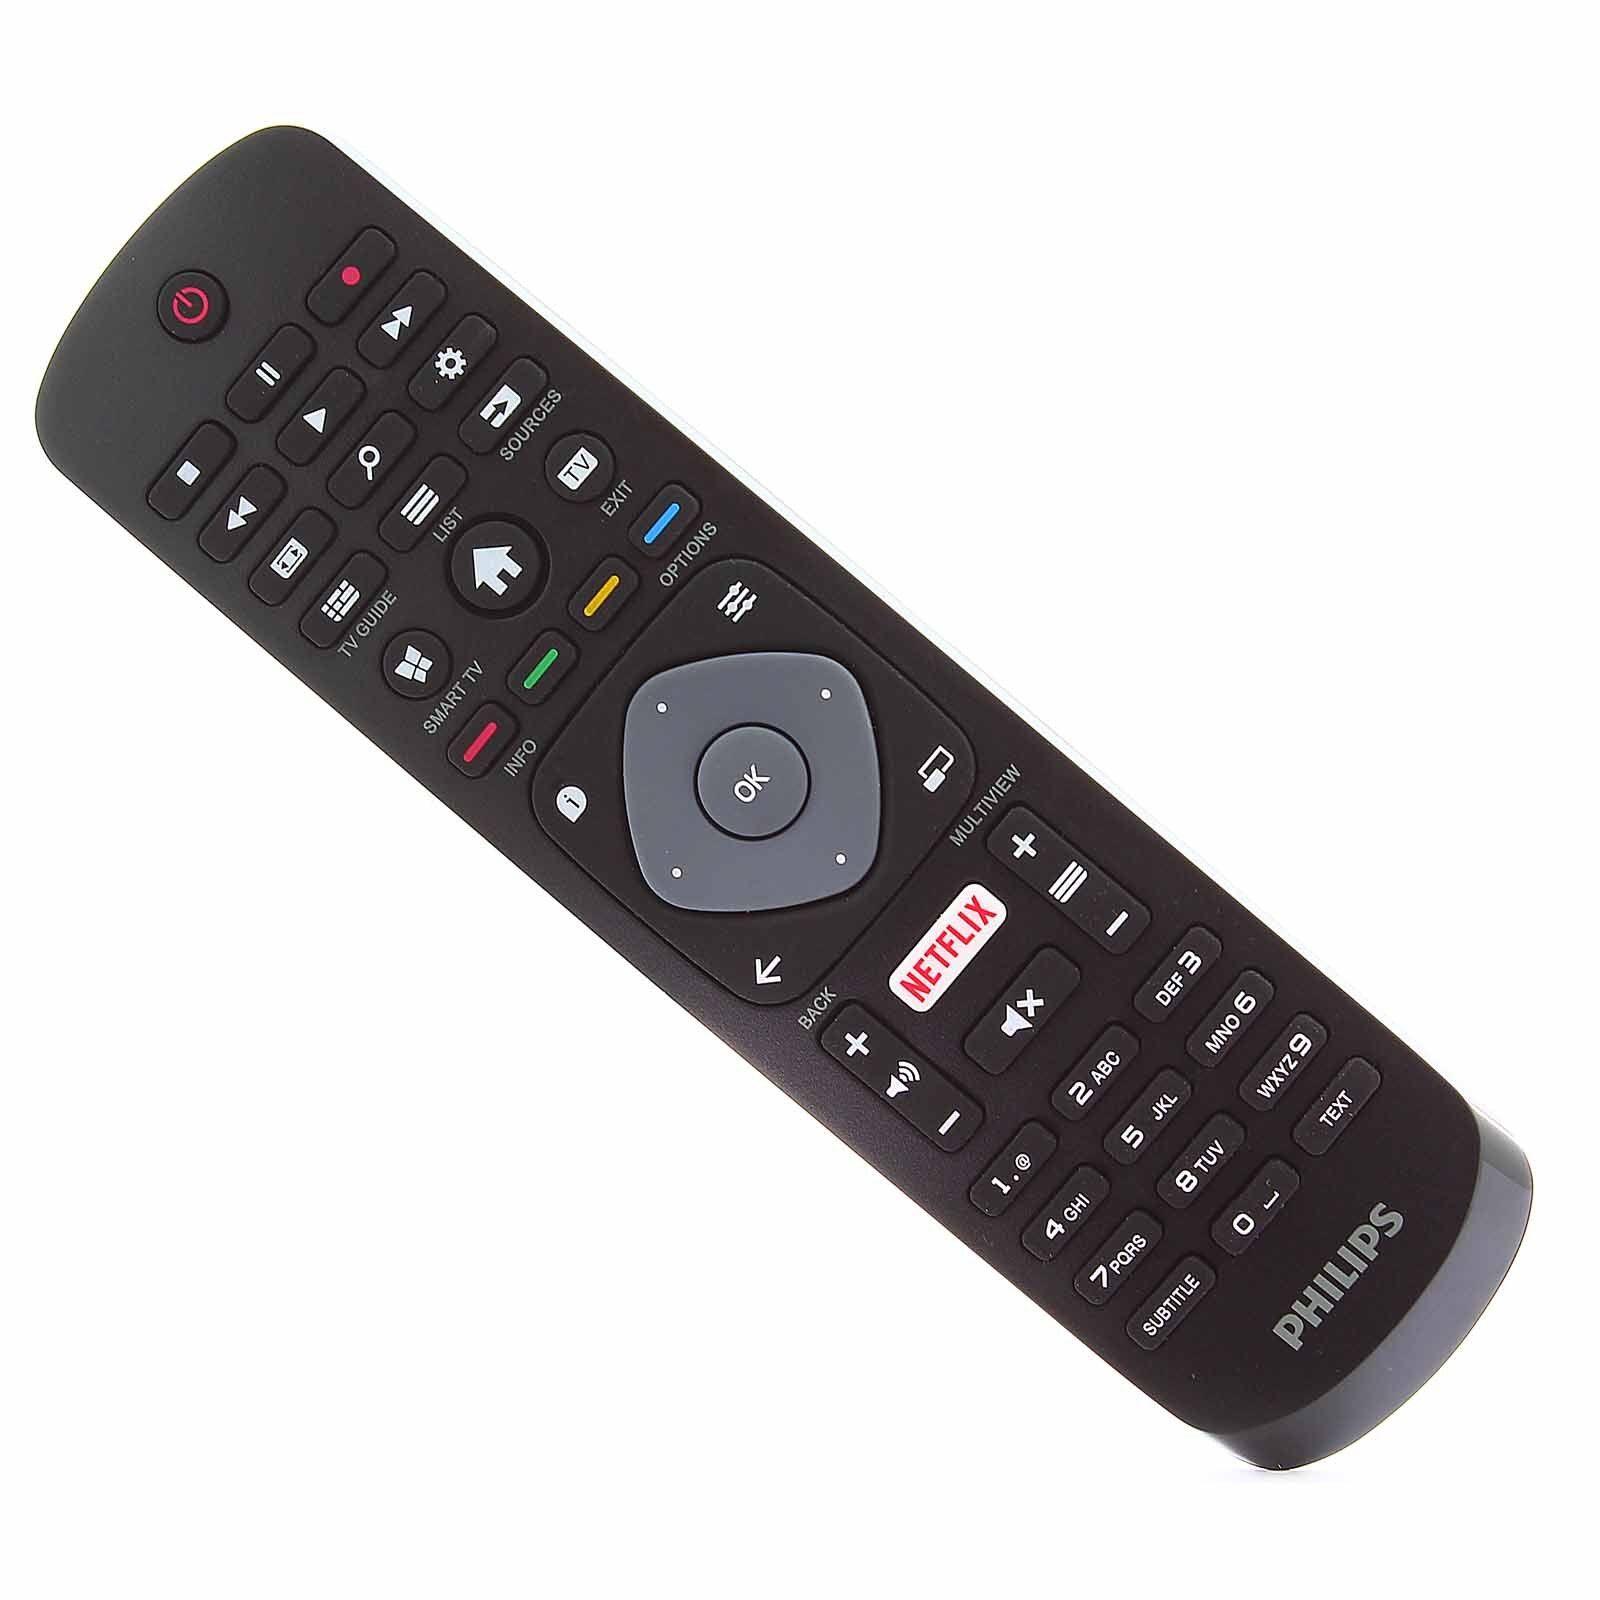 Dejlig Genuine Philips Remote Control for 55pus6272/05 55